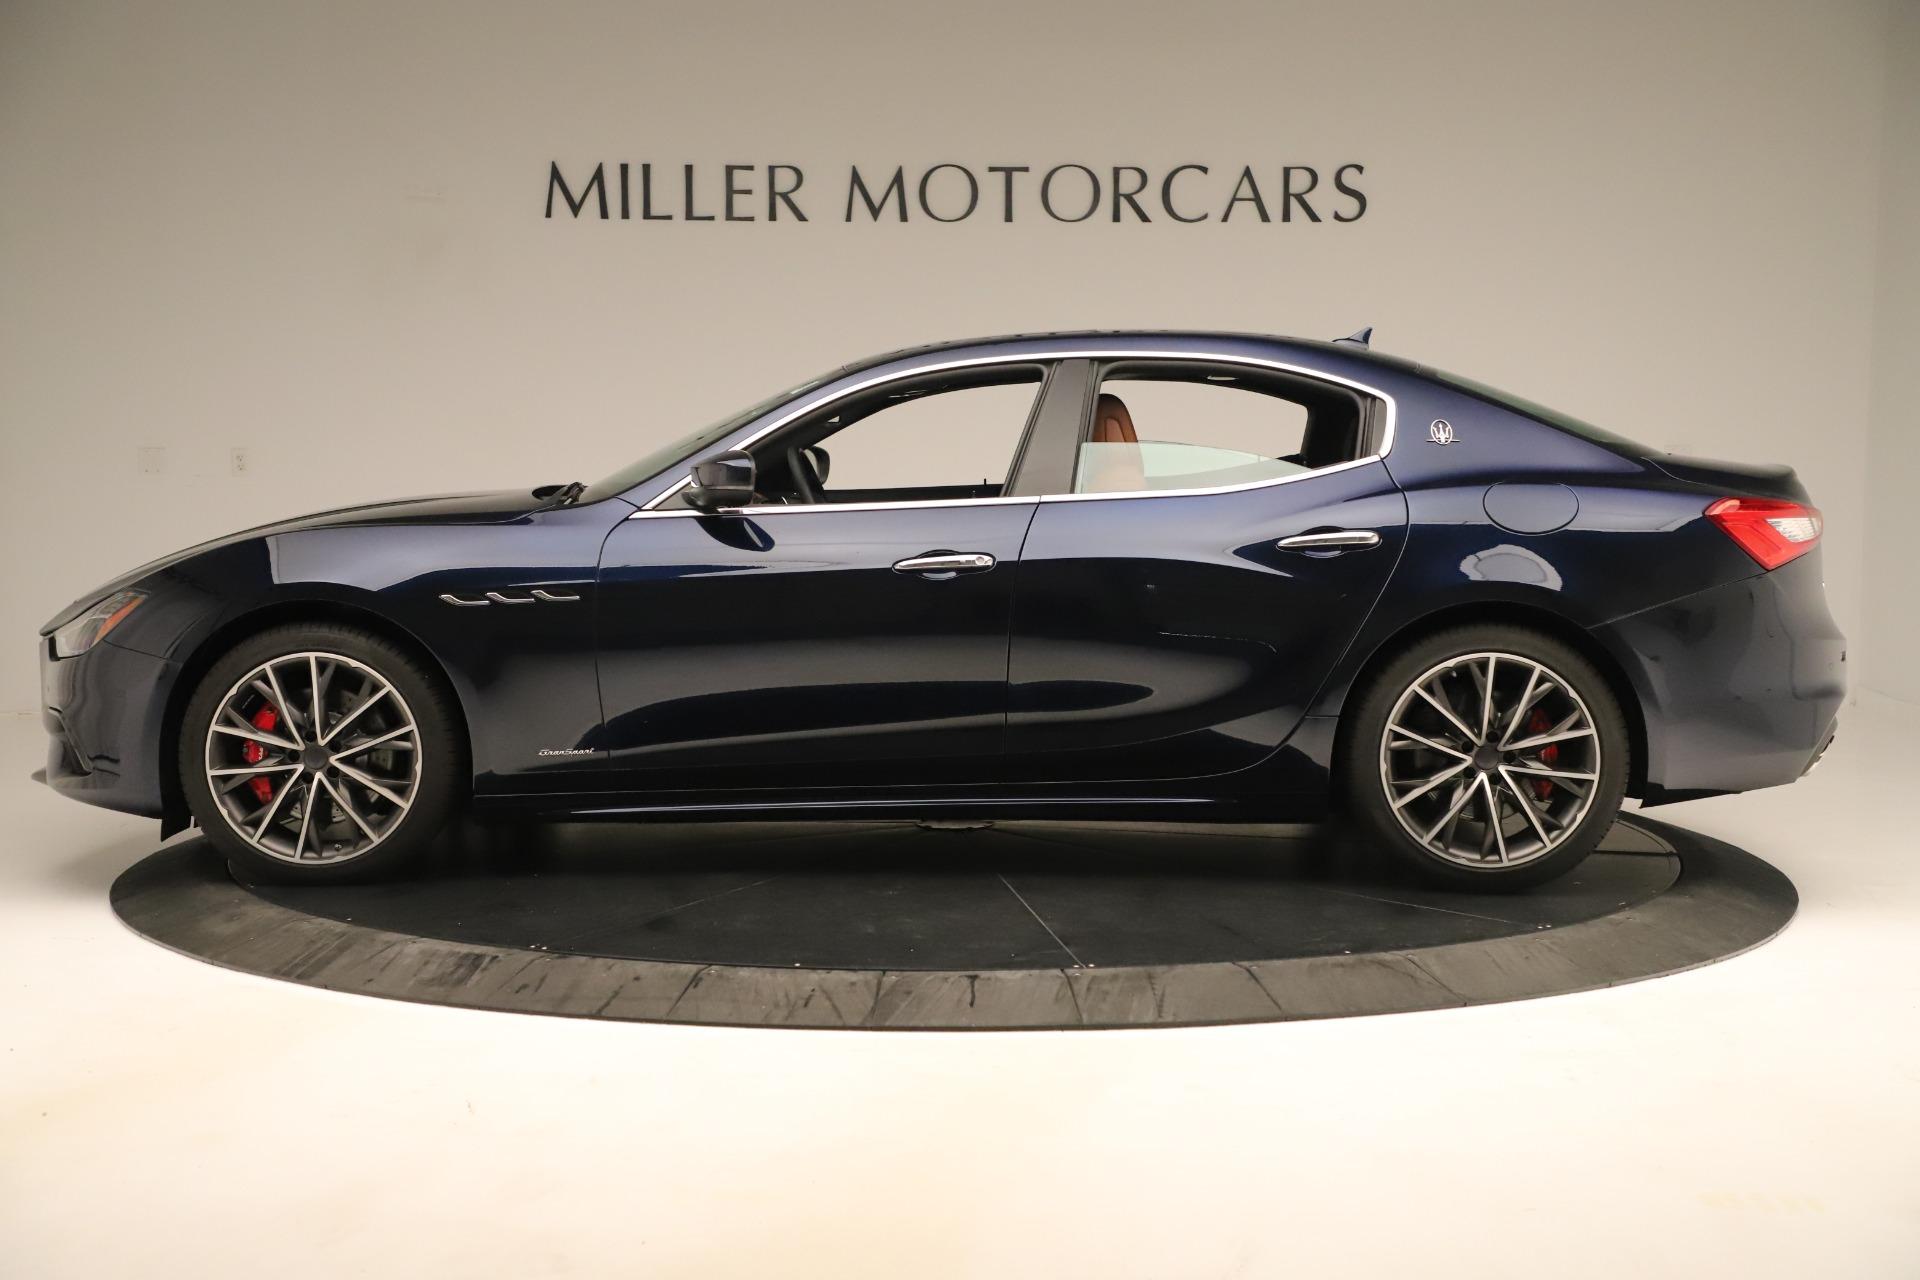 New 2019 Maserati Ghibli S Q4 GranSport For Sale In Greenwich, CT 2949_p3